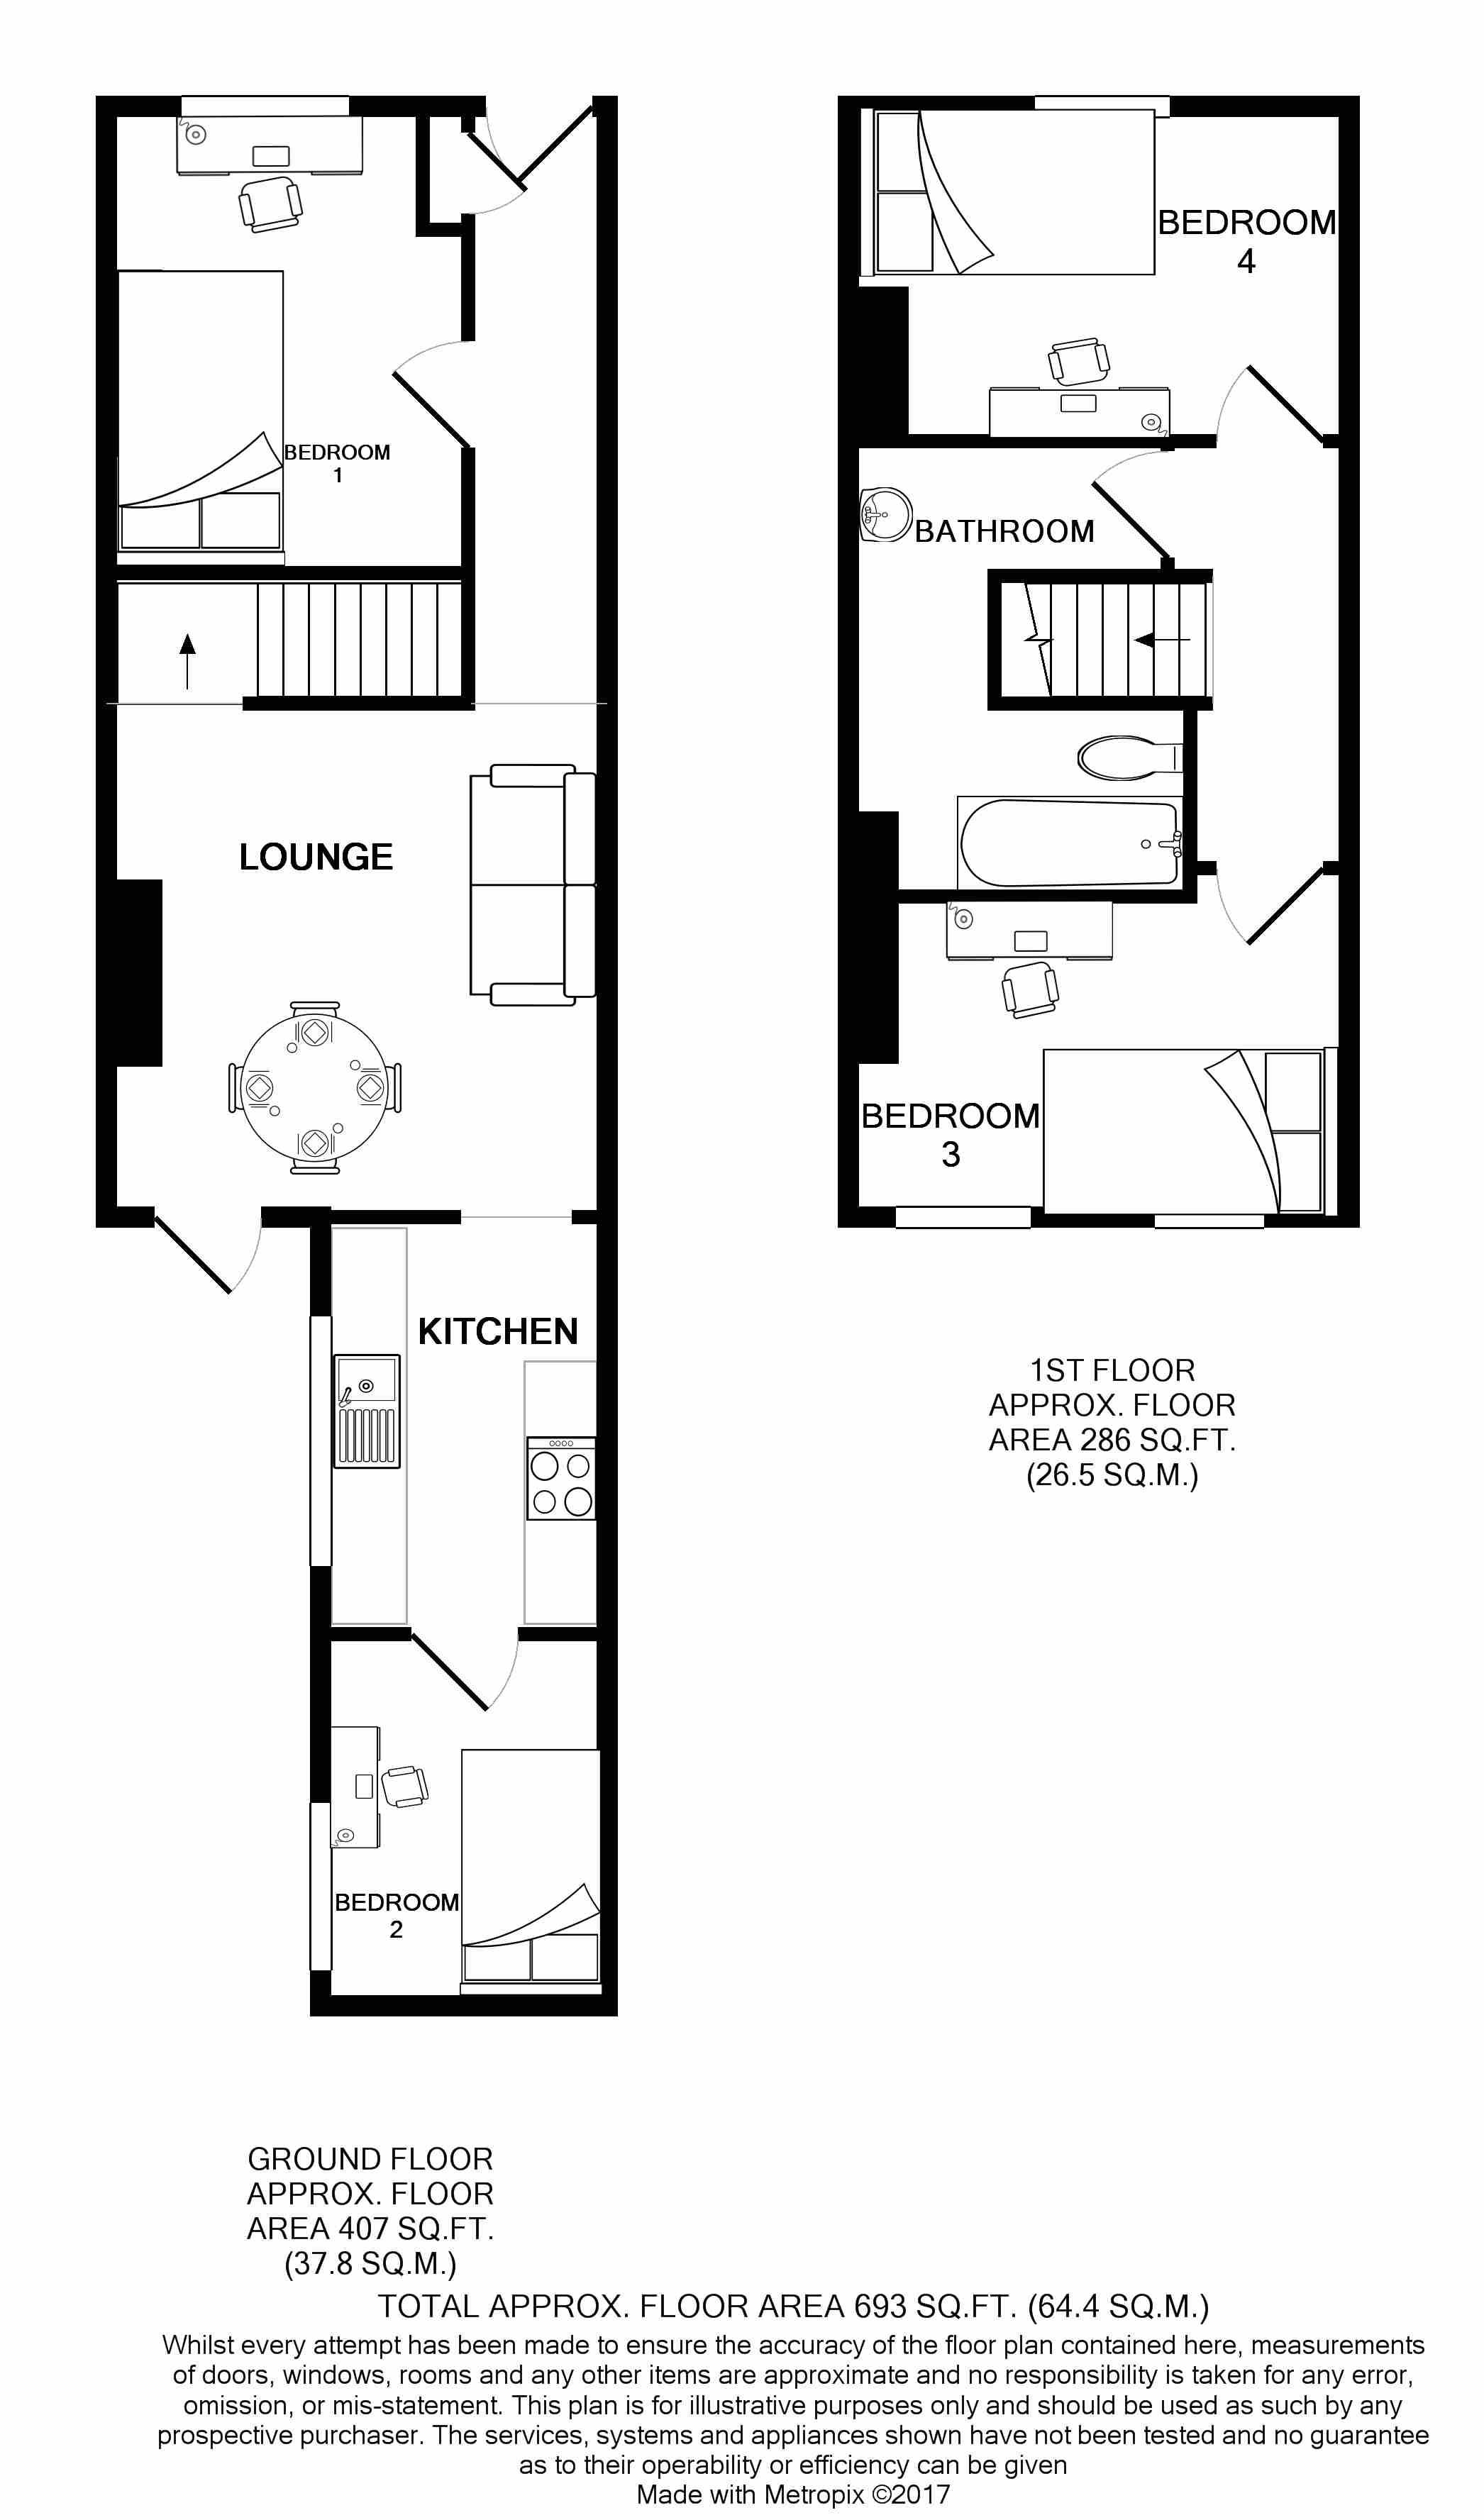 125 Ashford Street Floorplans